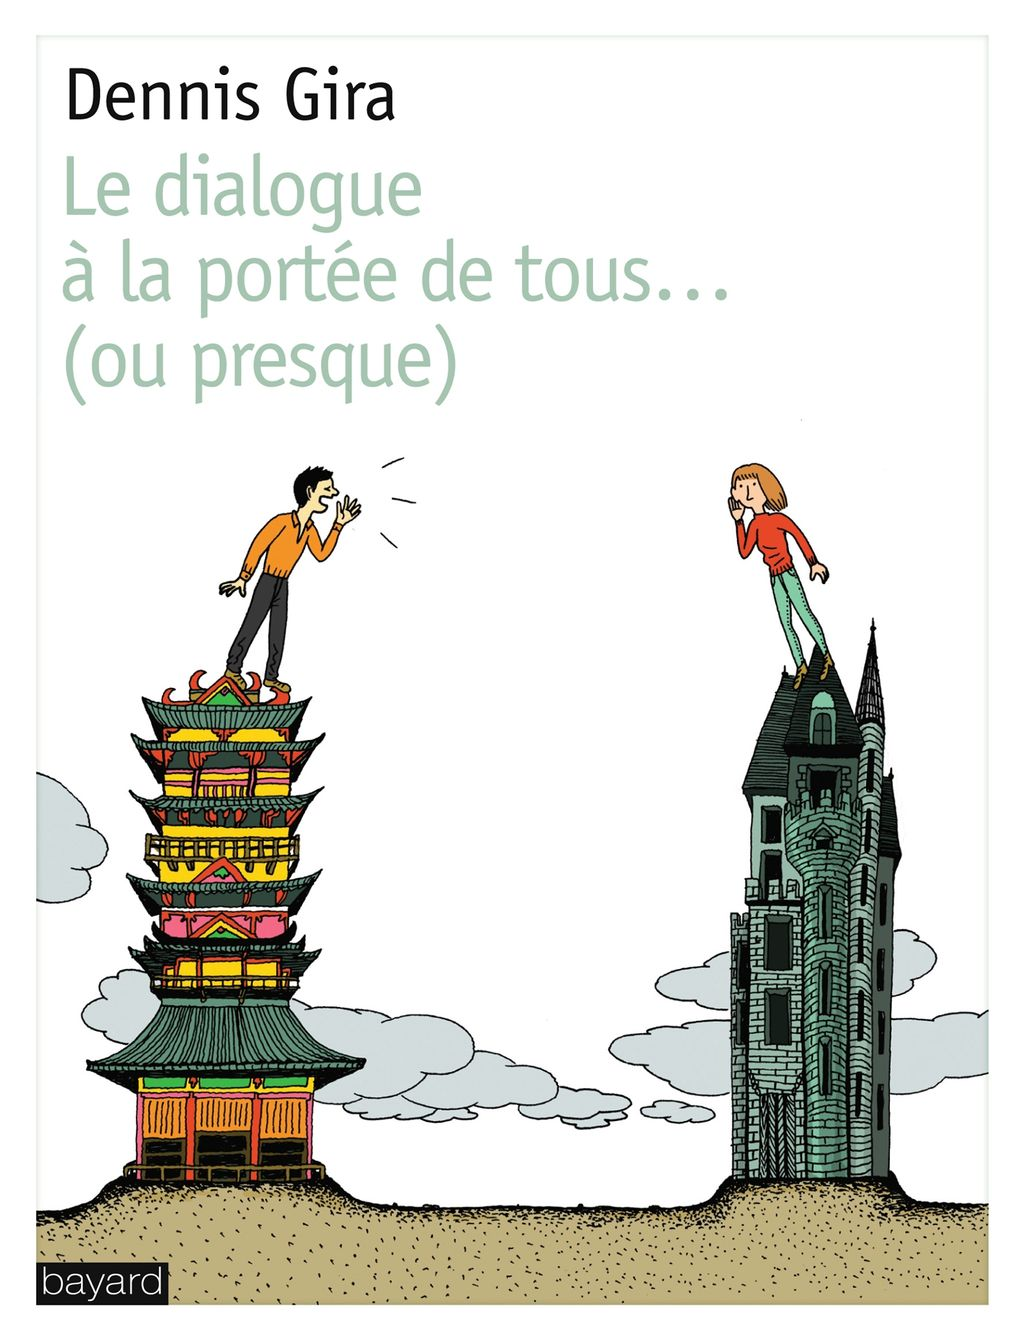 «DIALOGUE A LA PORTEE DE TOUS…OU PRESQUE (LE)» cover